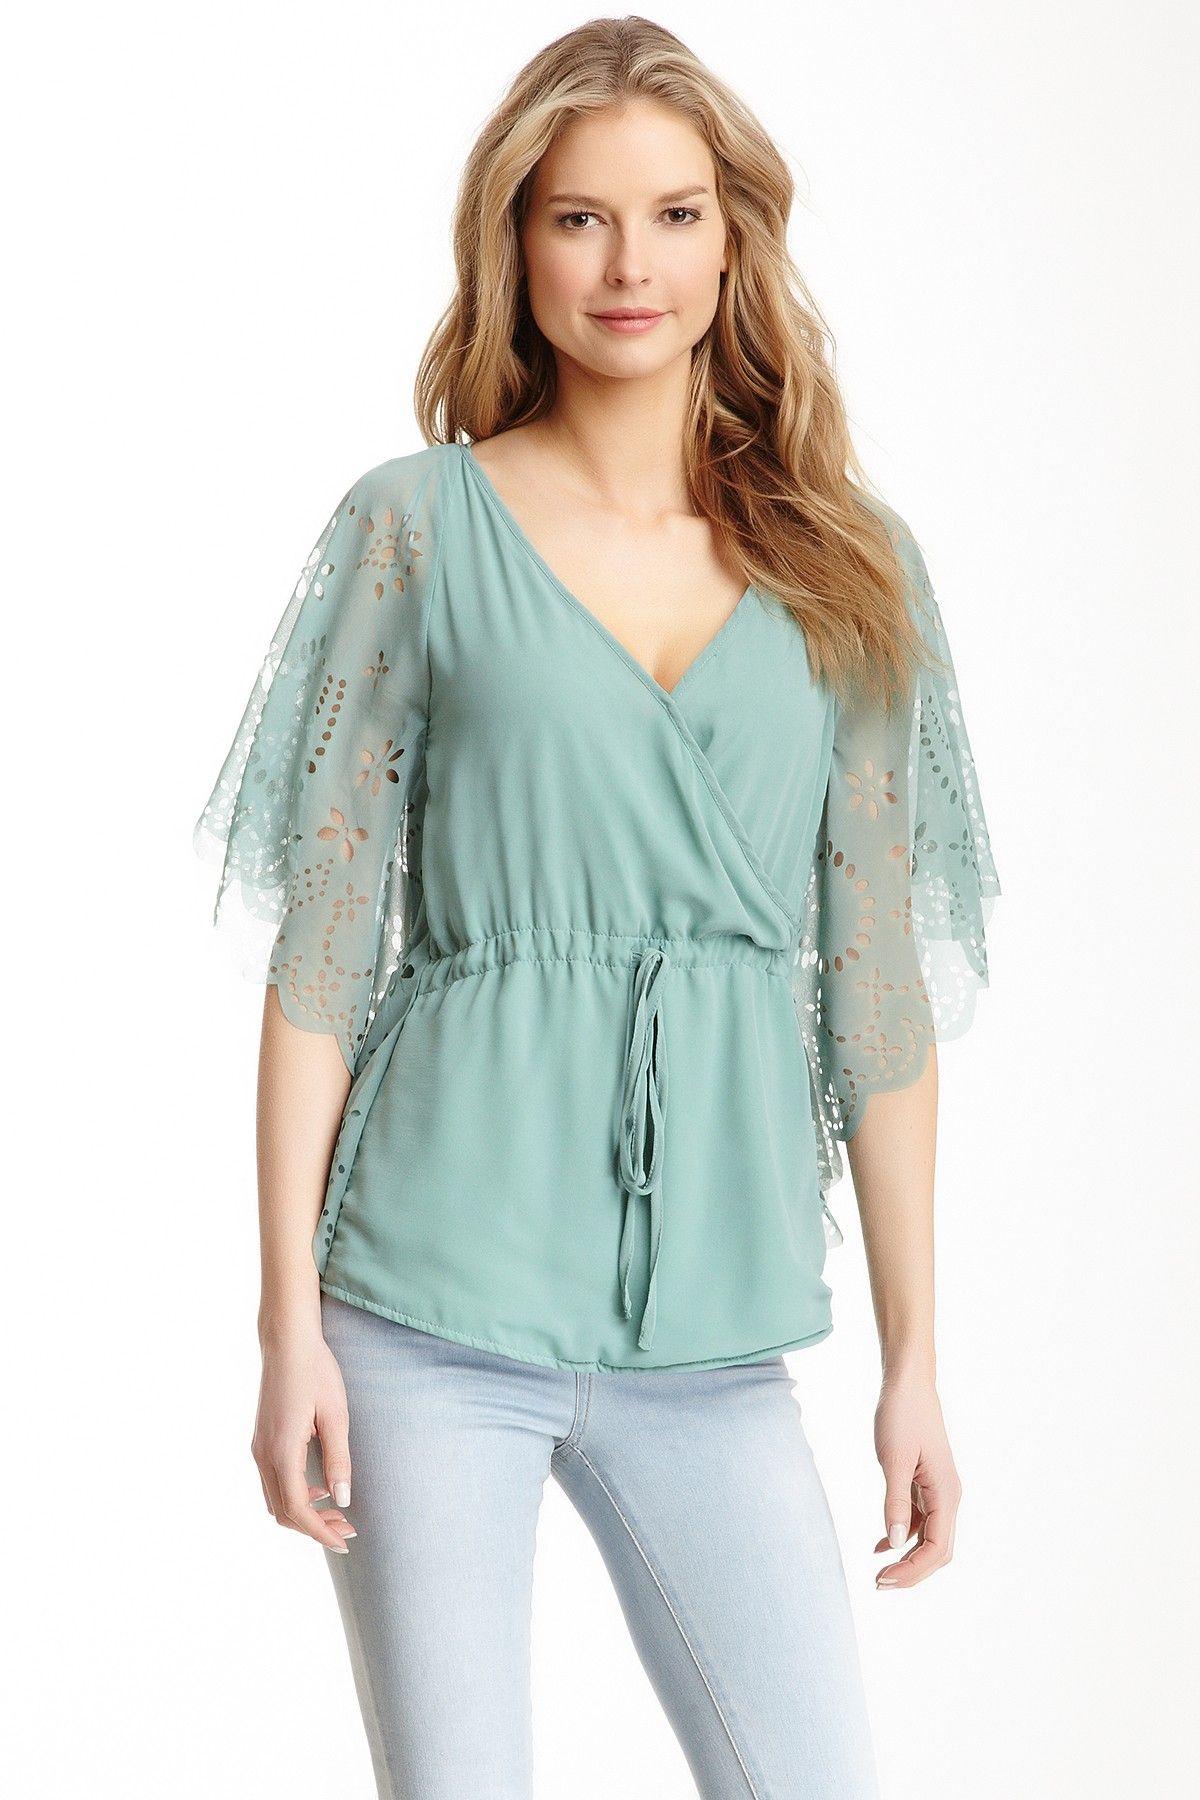 sea green laser cut blouse ++